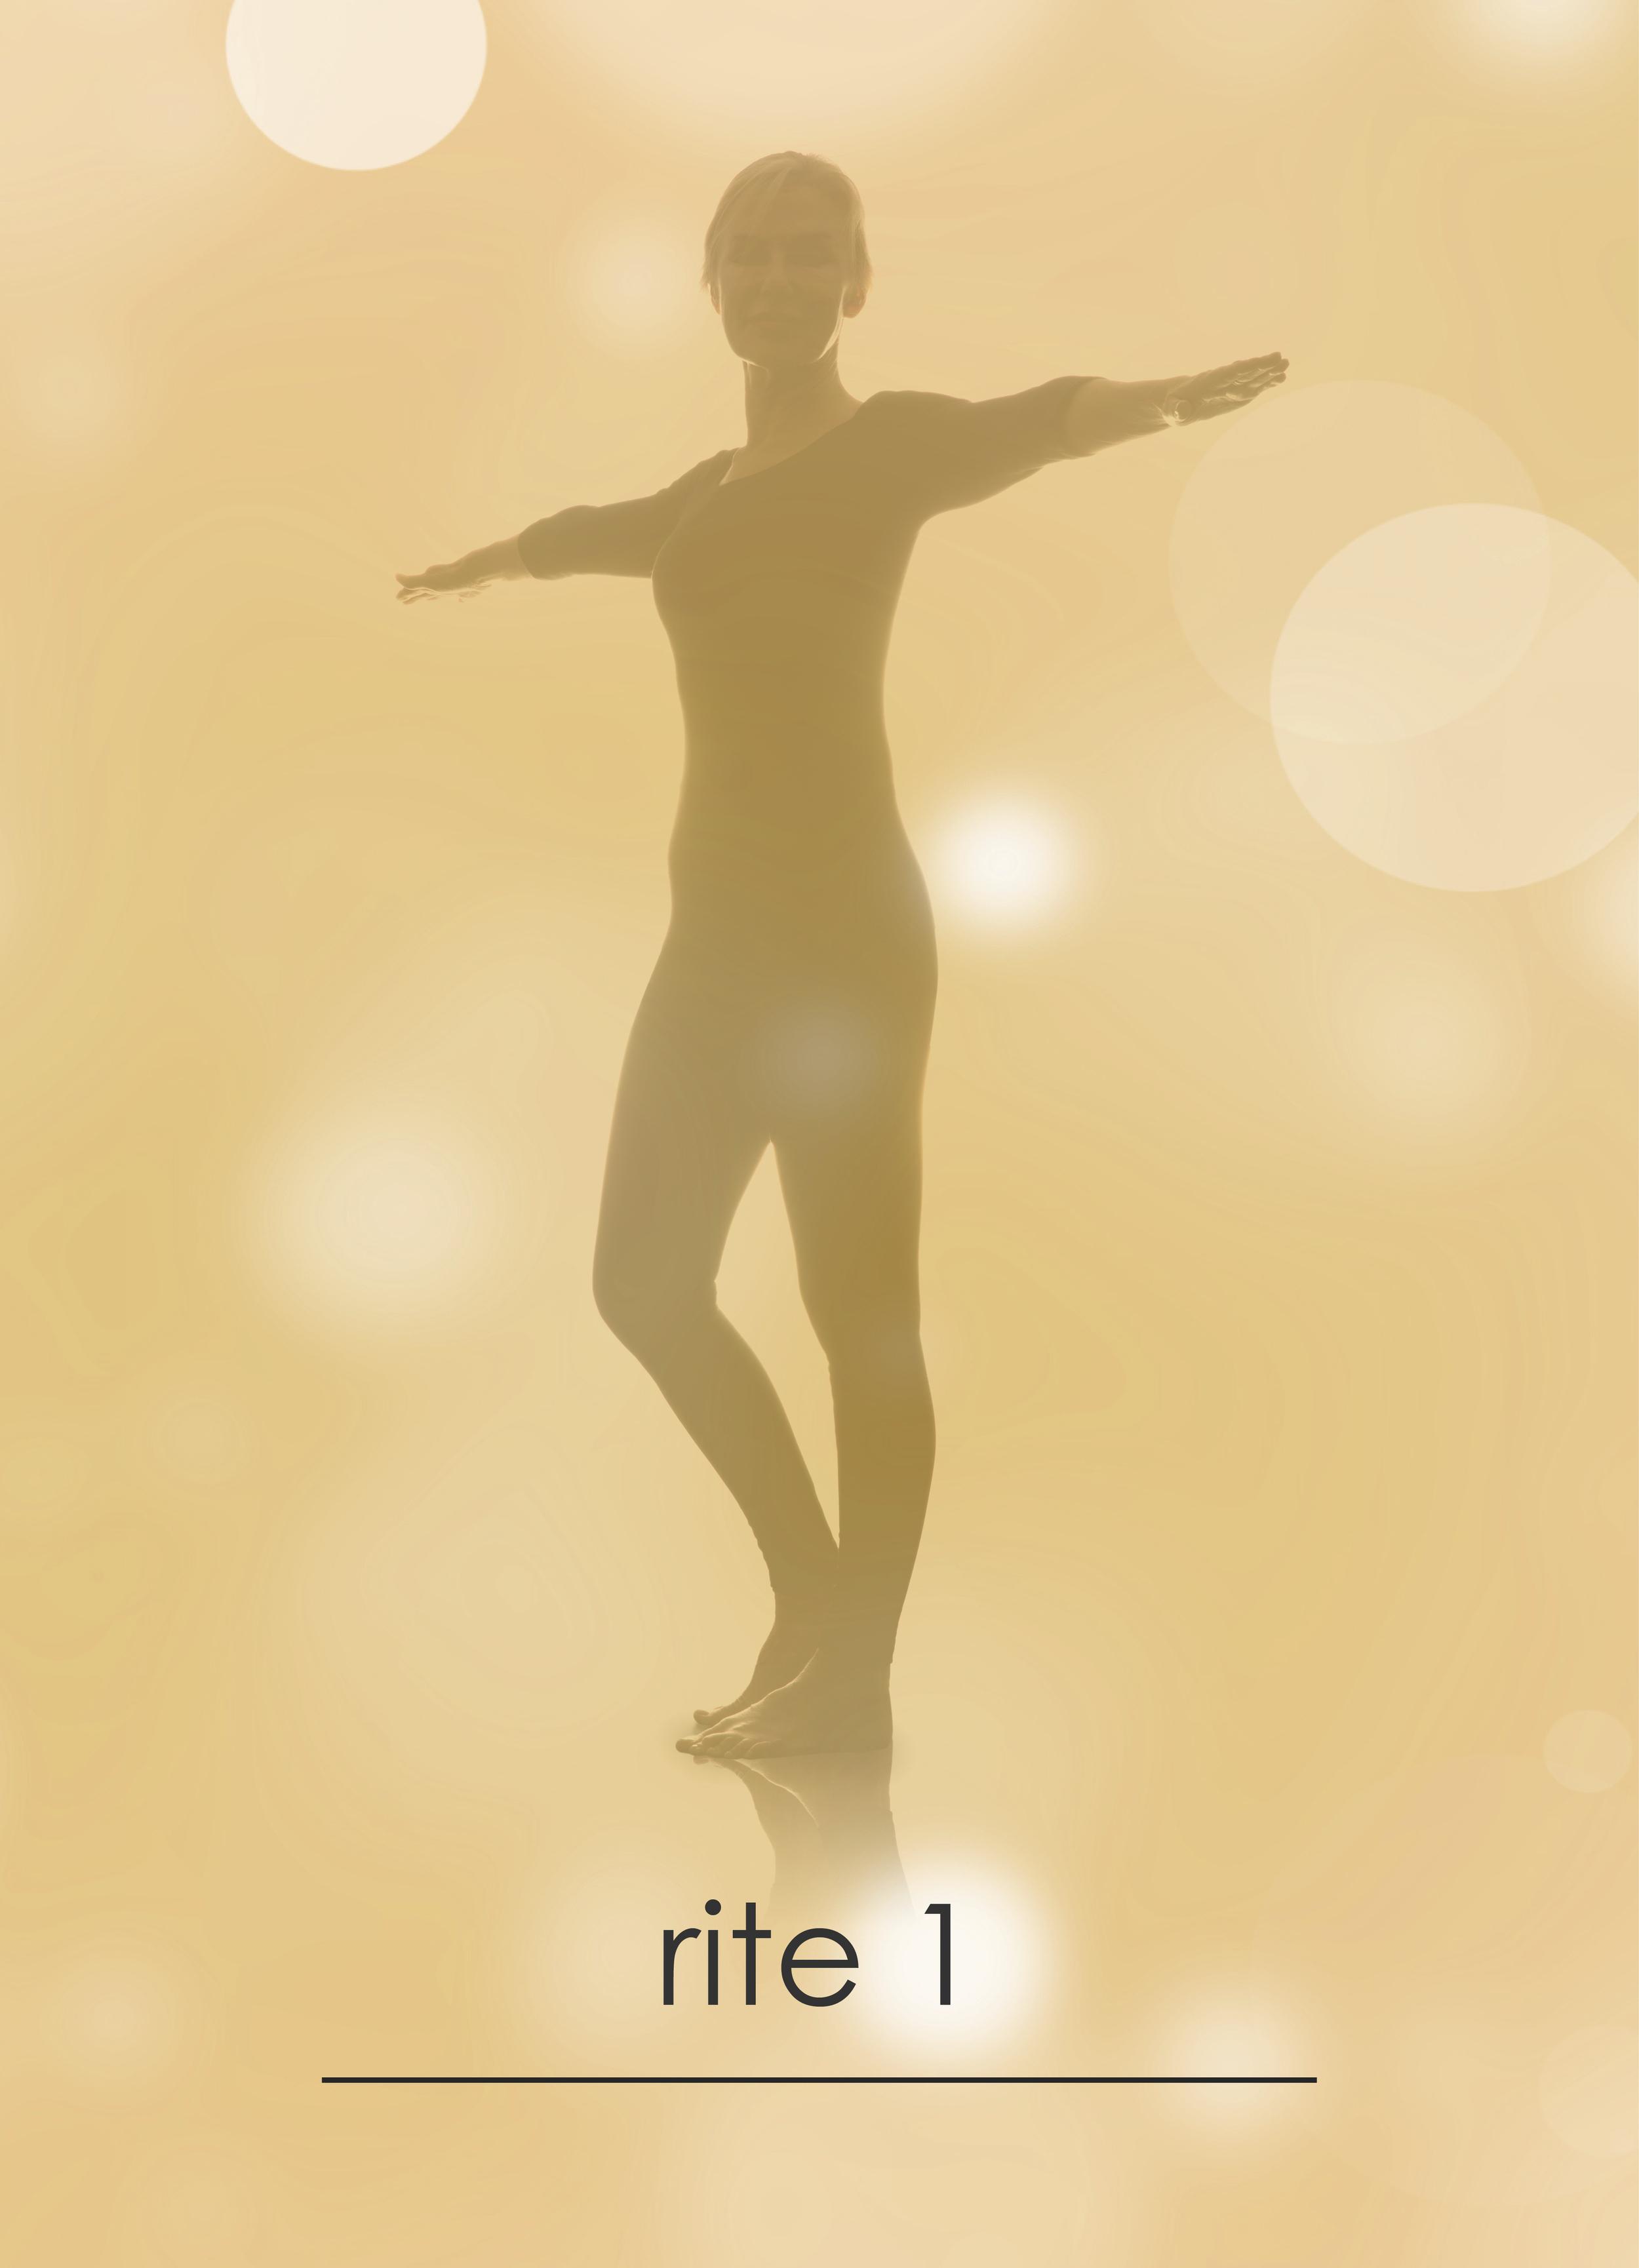 rites_for_life_yoga_rite_1e.jpg